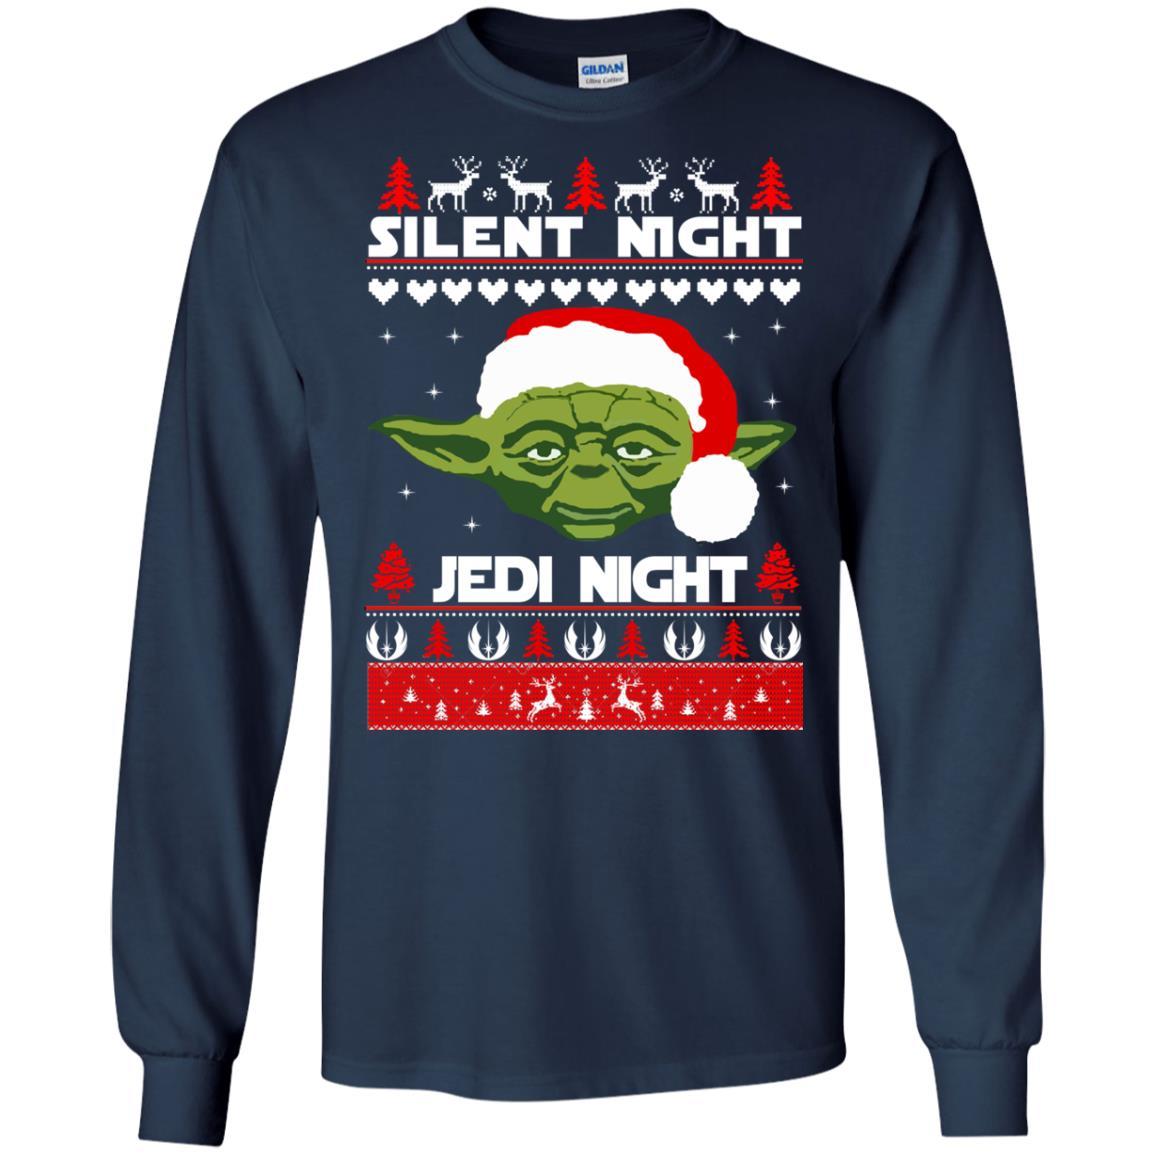 image 1713 - Yoda Star Wars: Silent Night Jedi Night Christmas Sweater, Hoodie